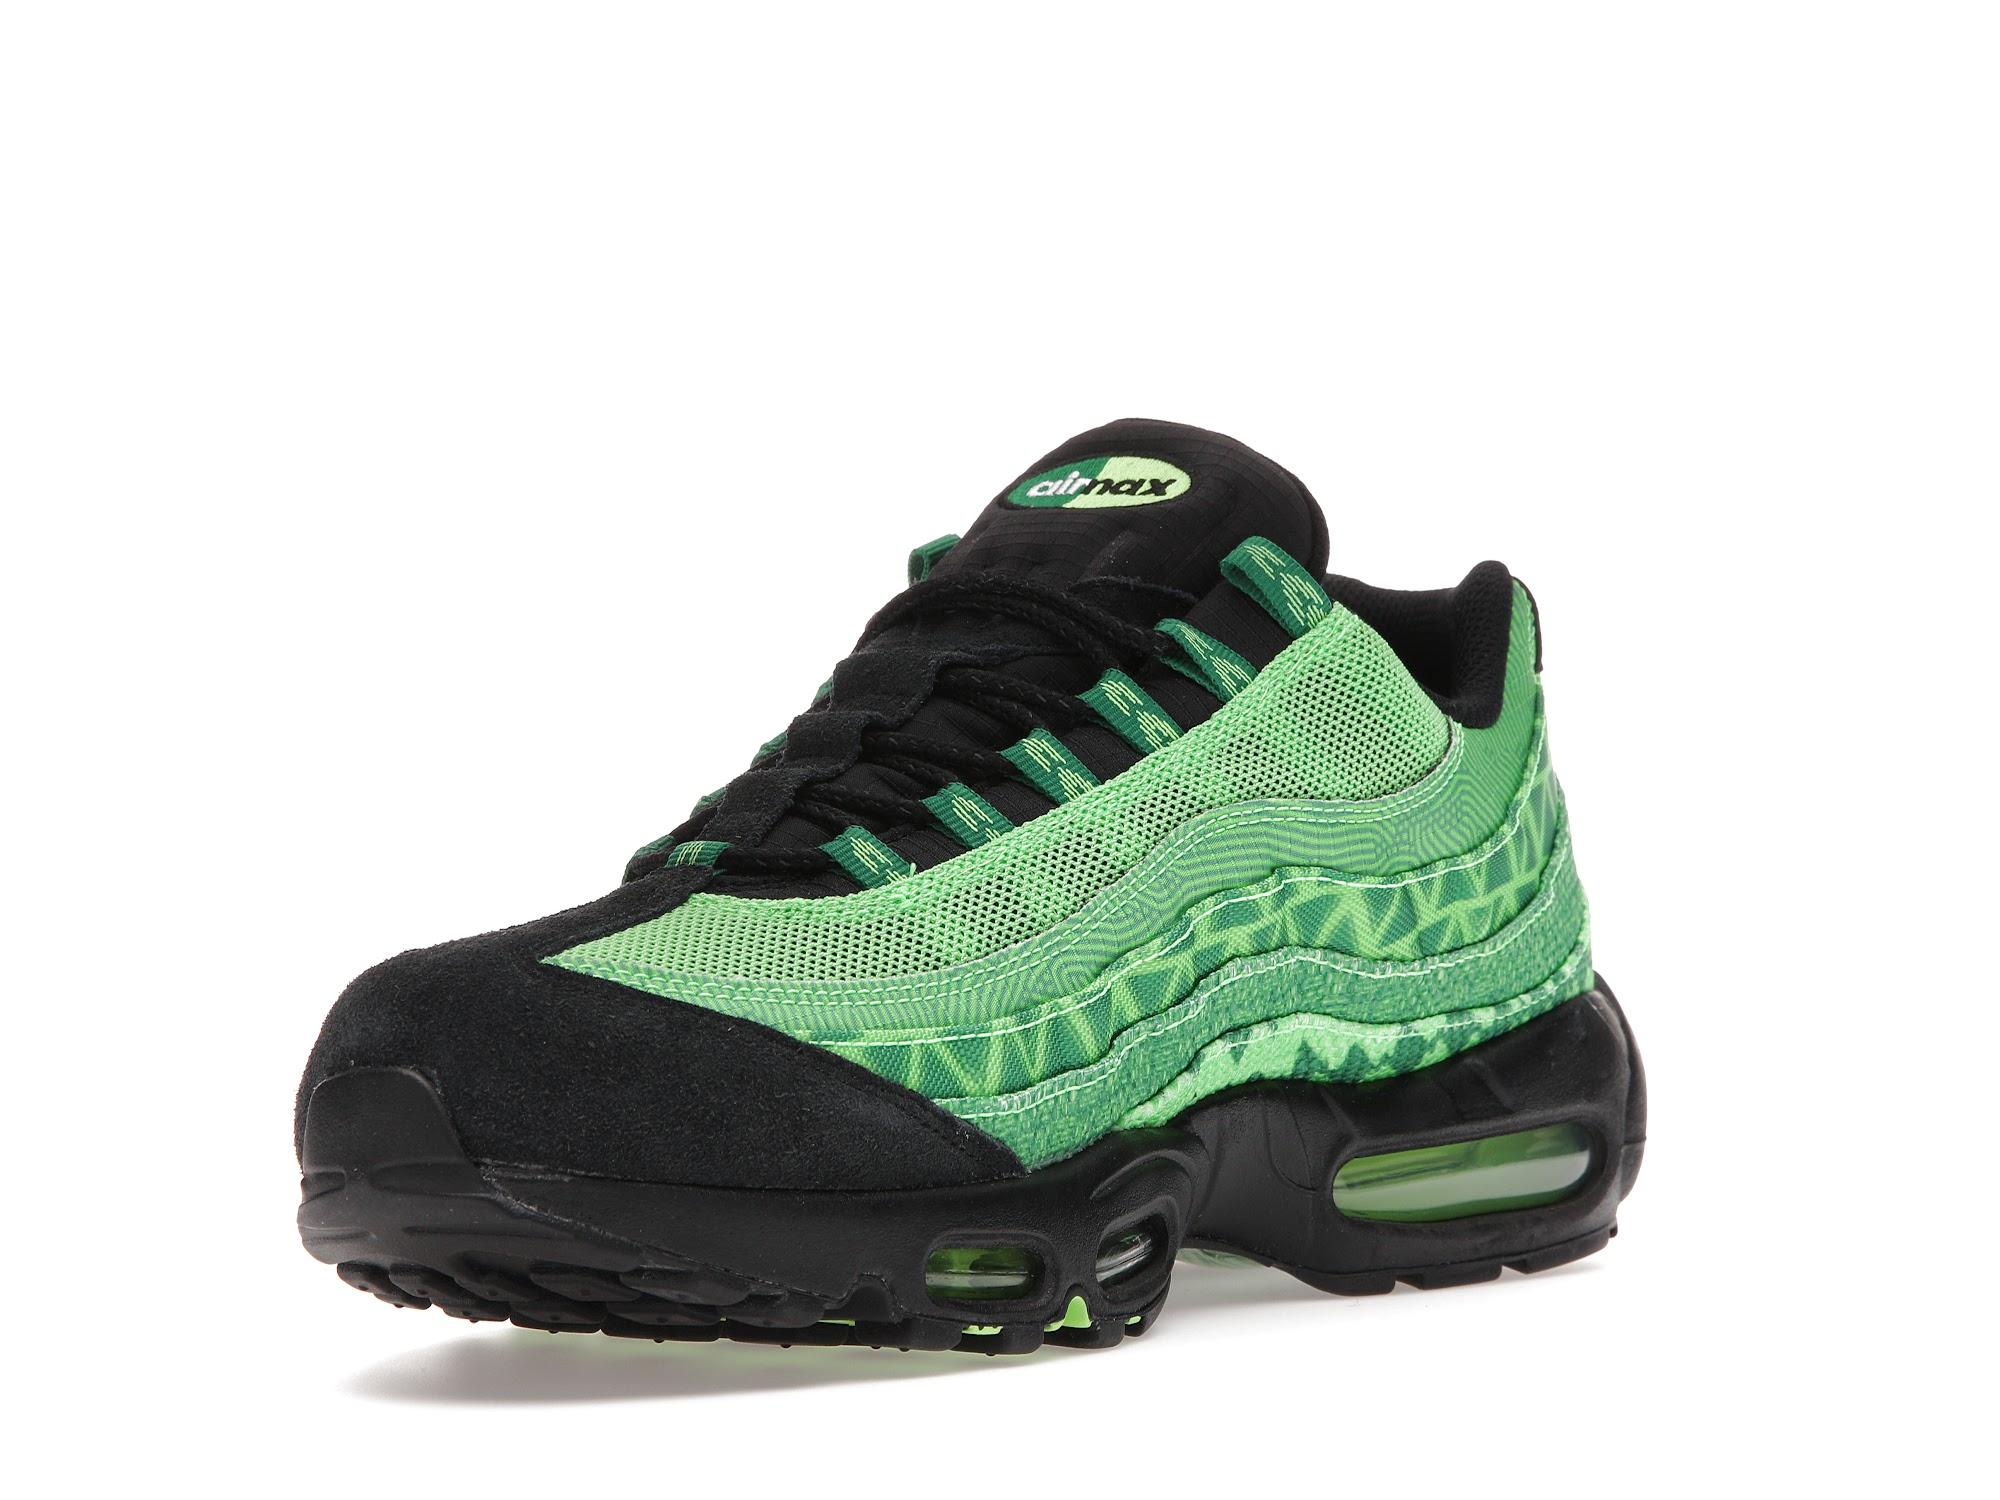 Nike Air Max 95 Naija - CW2360-300